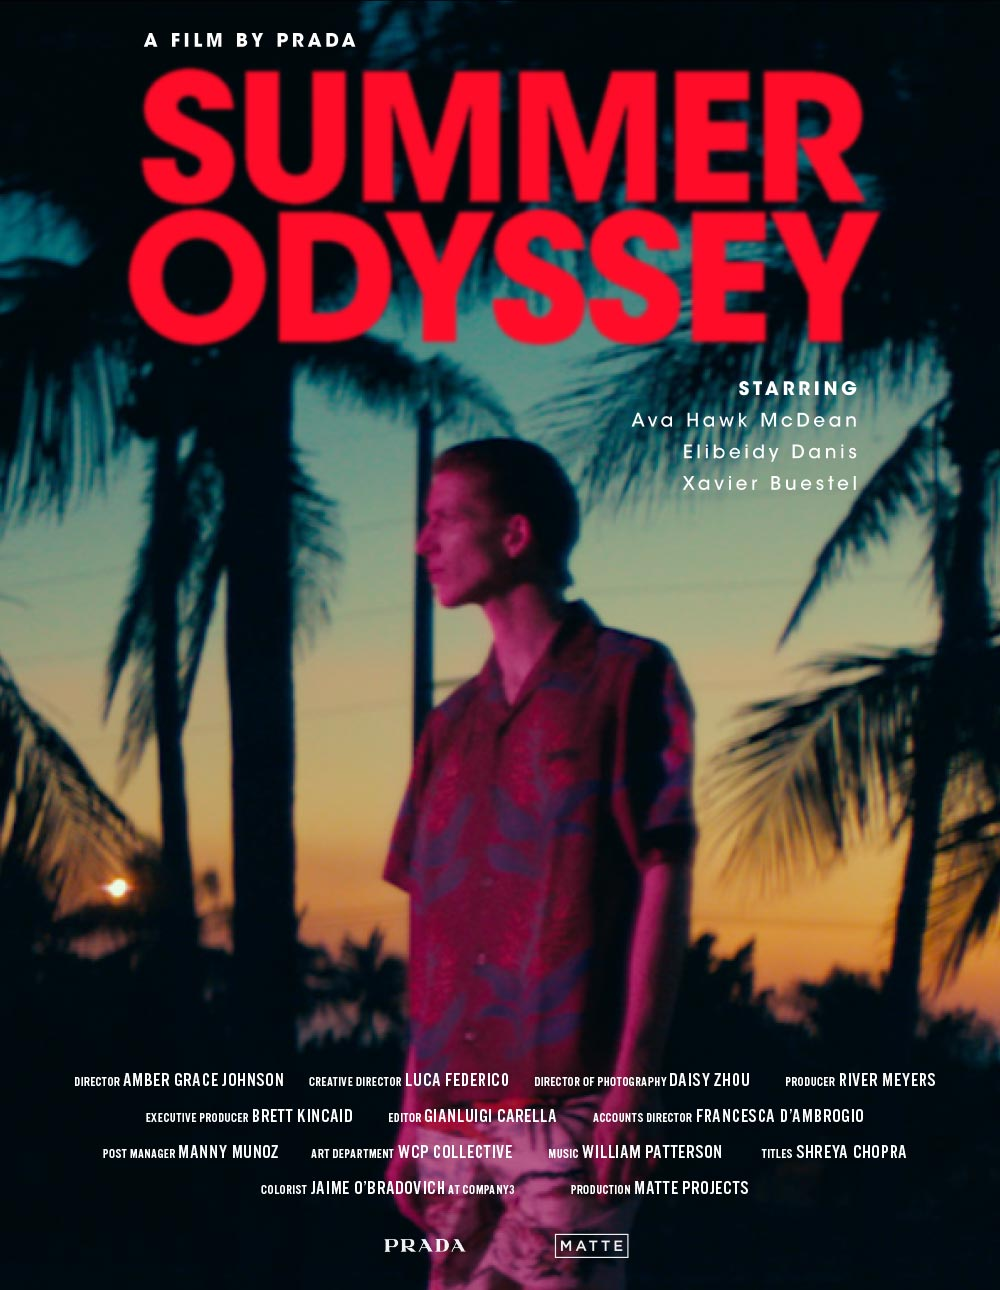 PRADA - Summer Odyssey short film